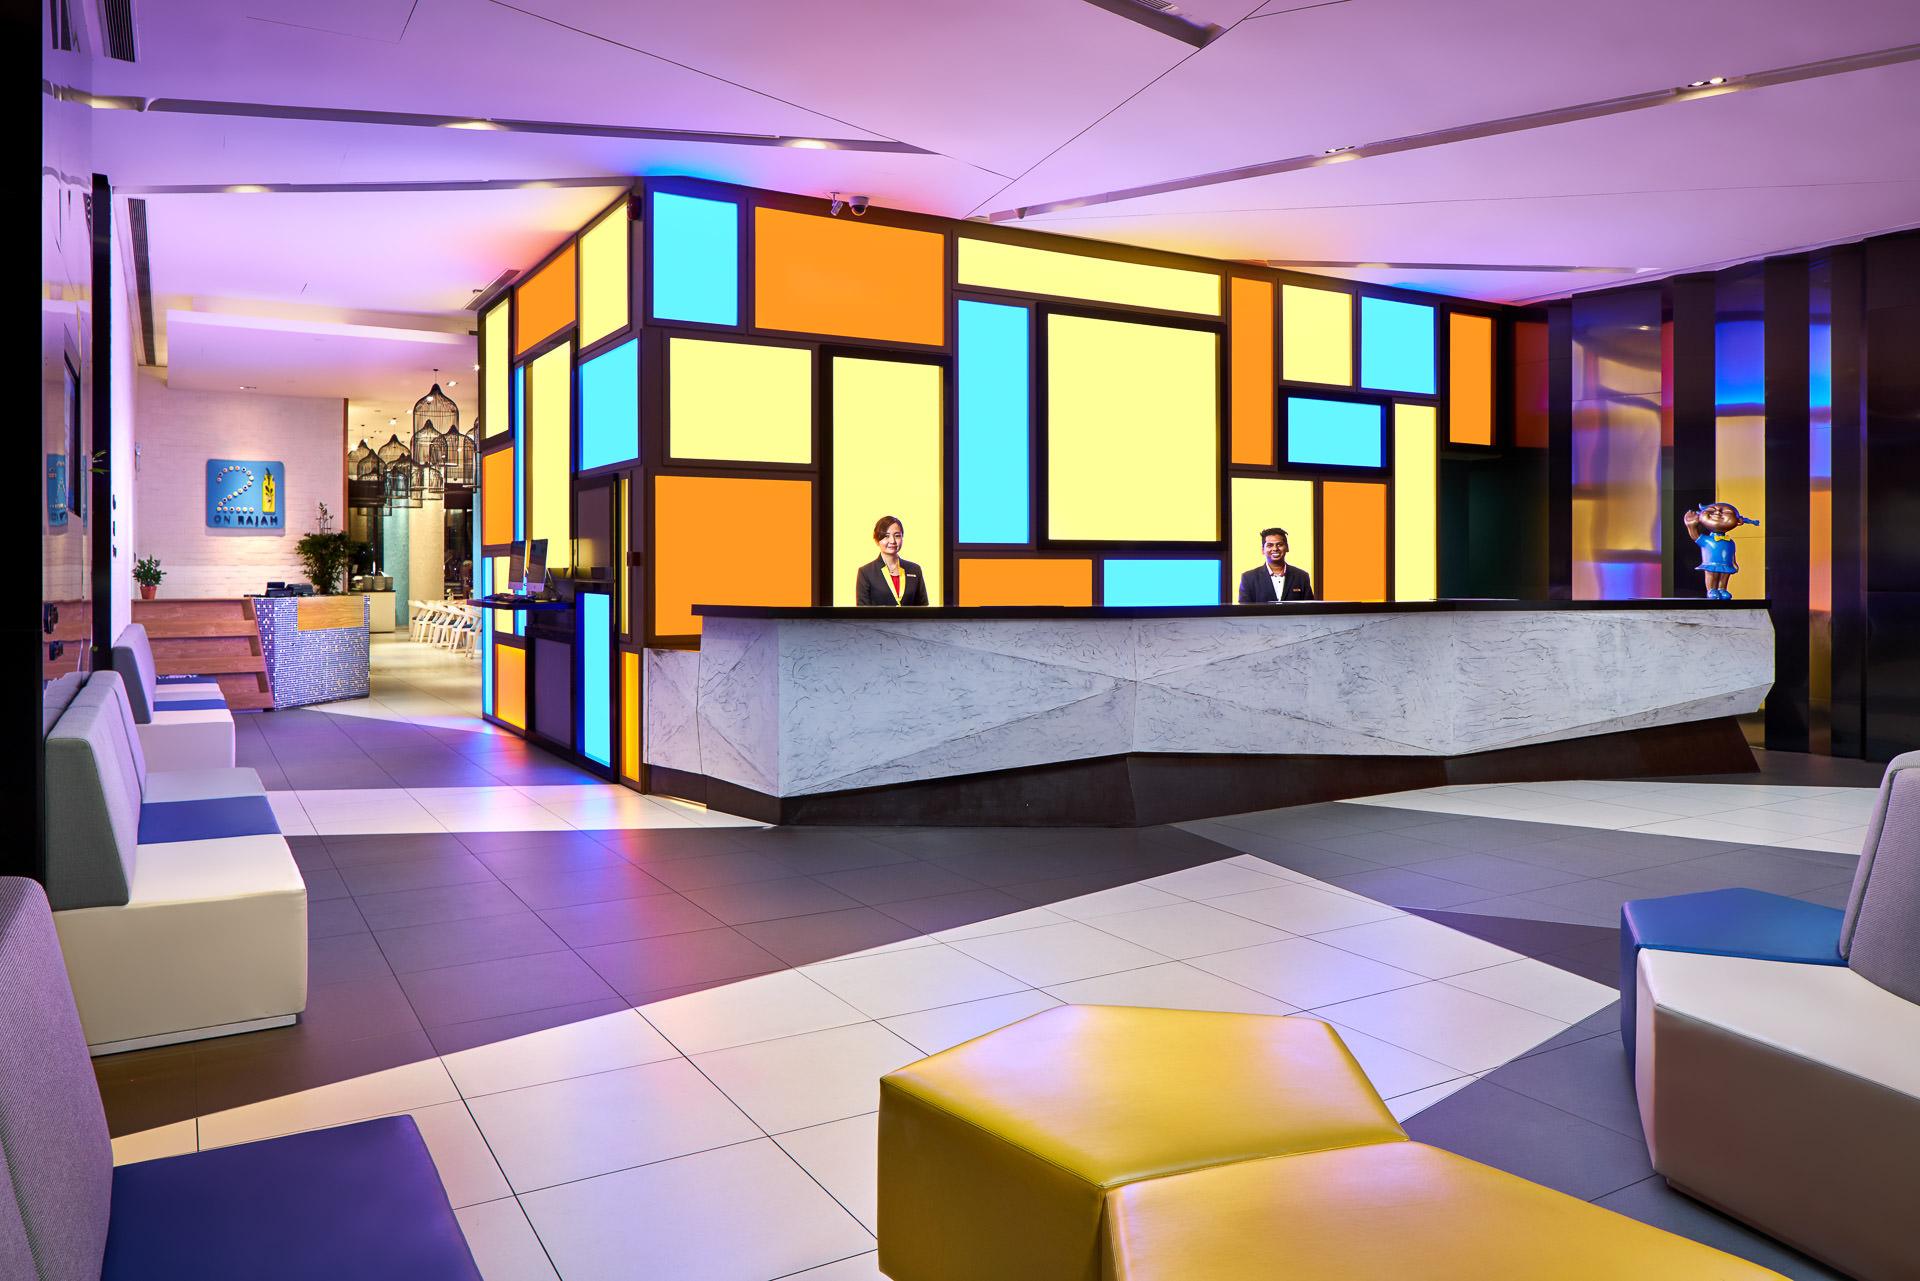 Architectural interior photographer in singapore for Designhotel 21